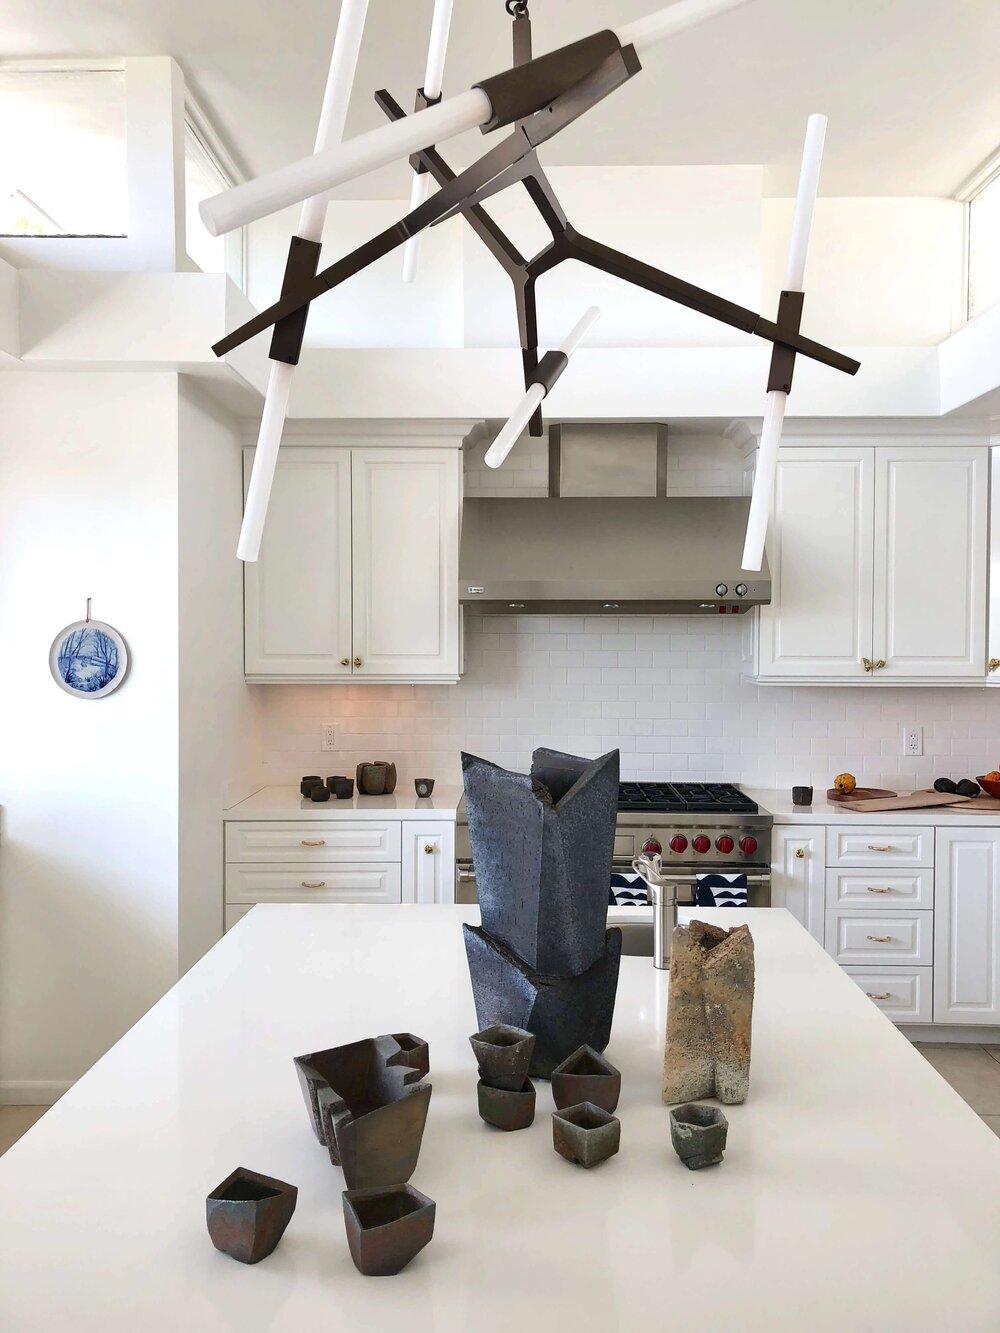 Statement modern lighting works well in this simple white kitchen at Casa Perfect in LA. #whitekitchen